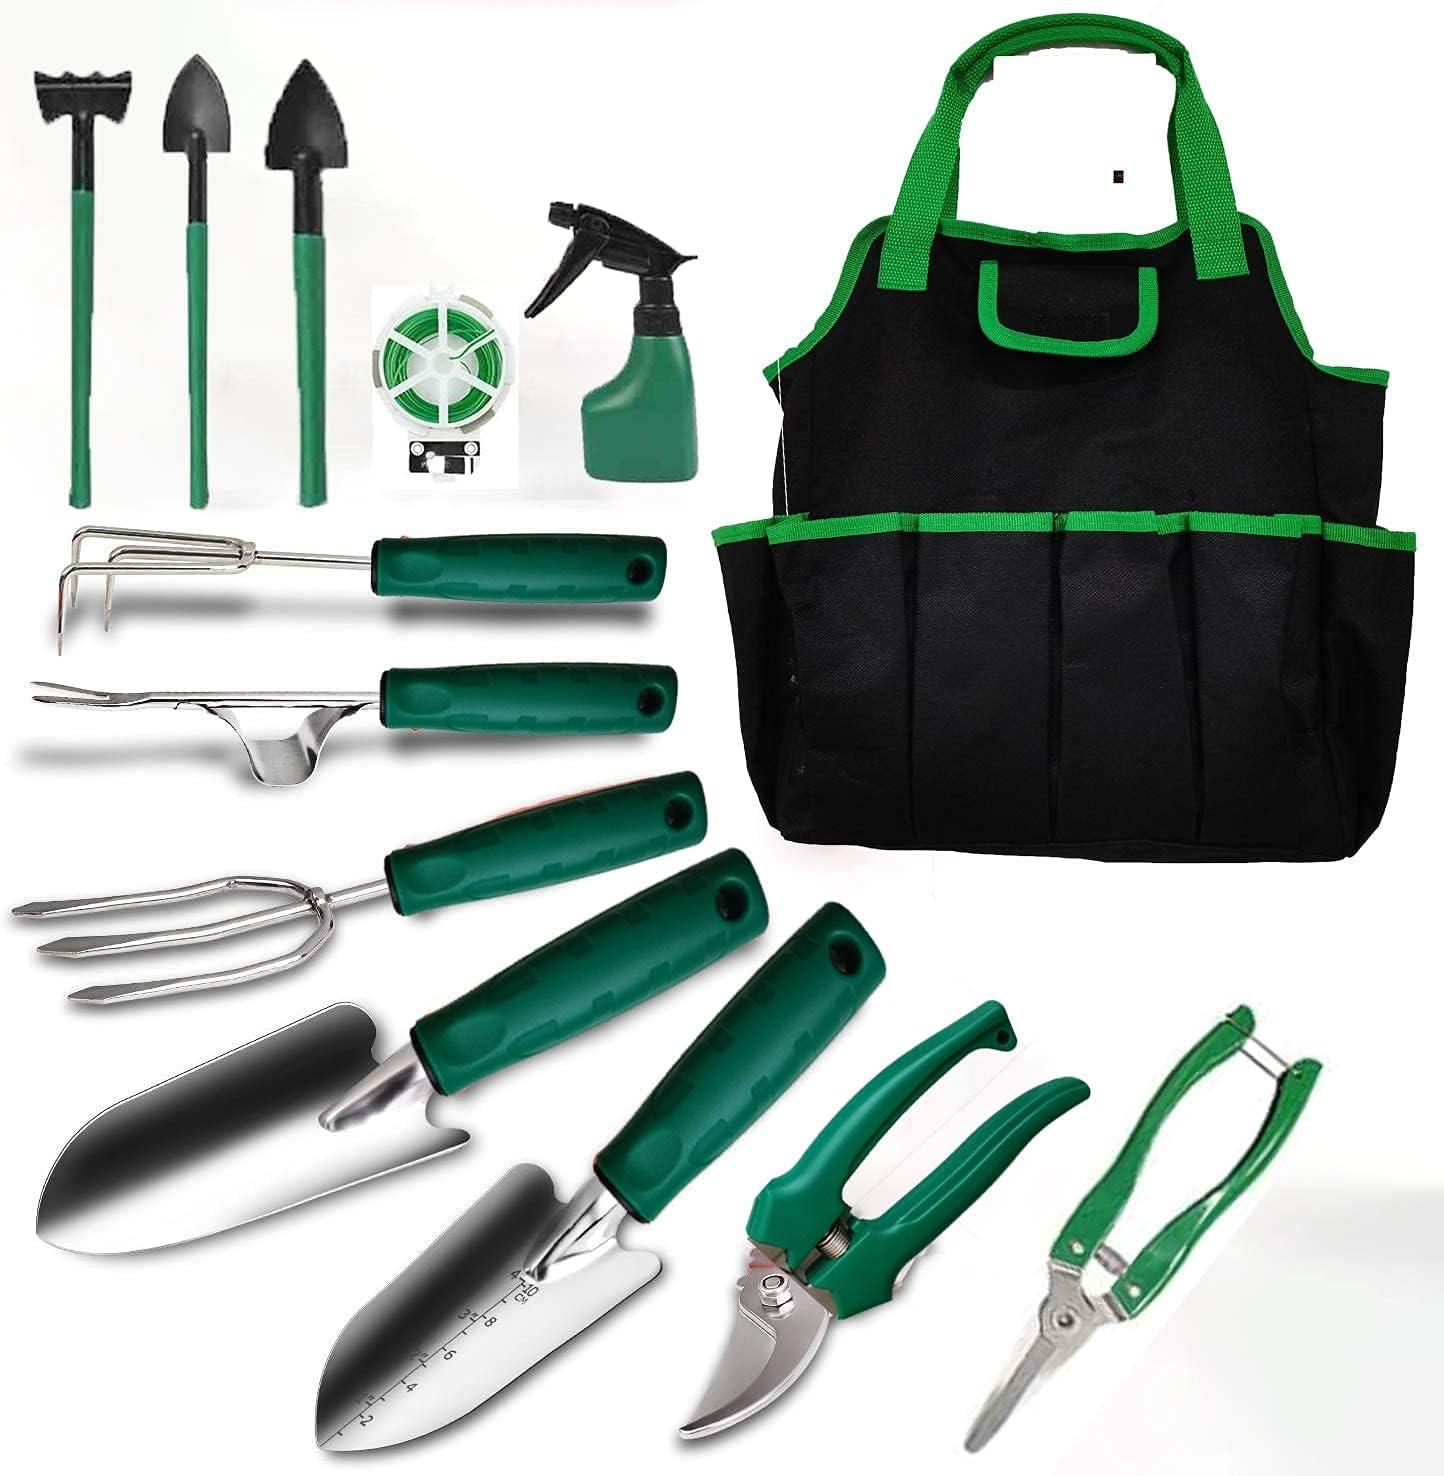 TOORGGOO Gardening Tools Set with Storage Pocket, 13 Piece Stainless Heavy Duty Hand Garden Tools Kit,Gardening Gifts for Mother Women Men Gardener.(Green)